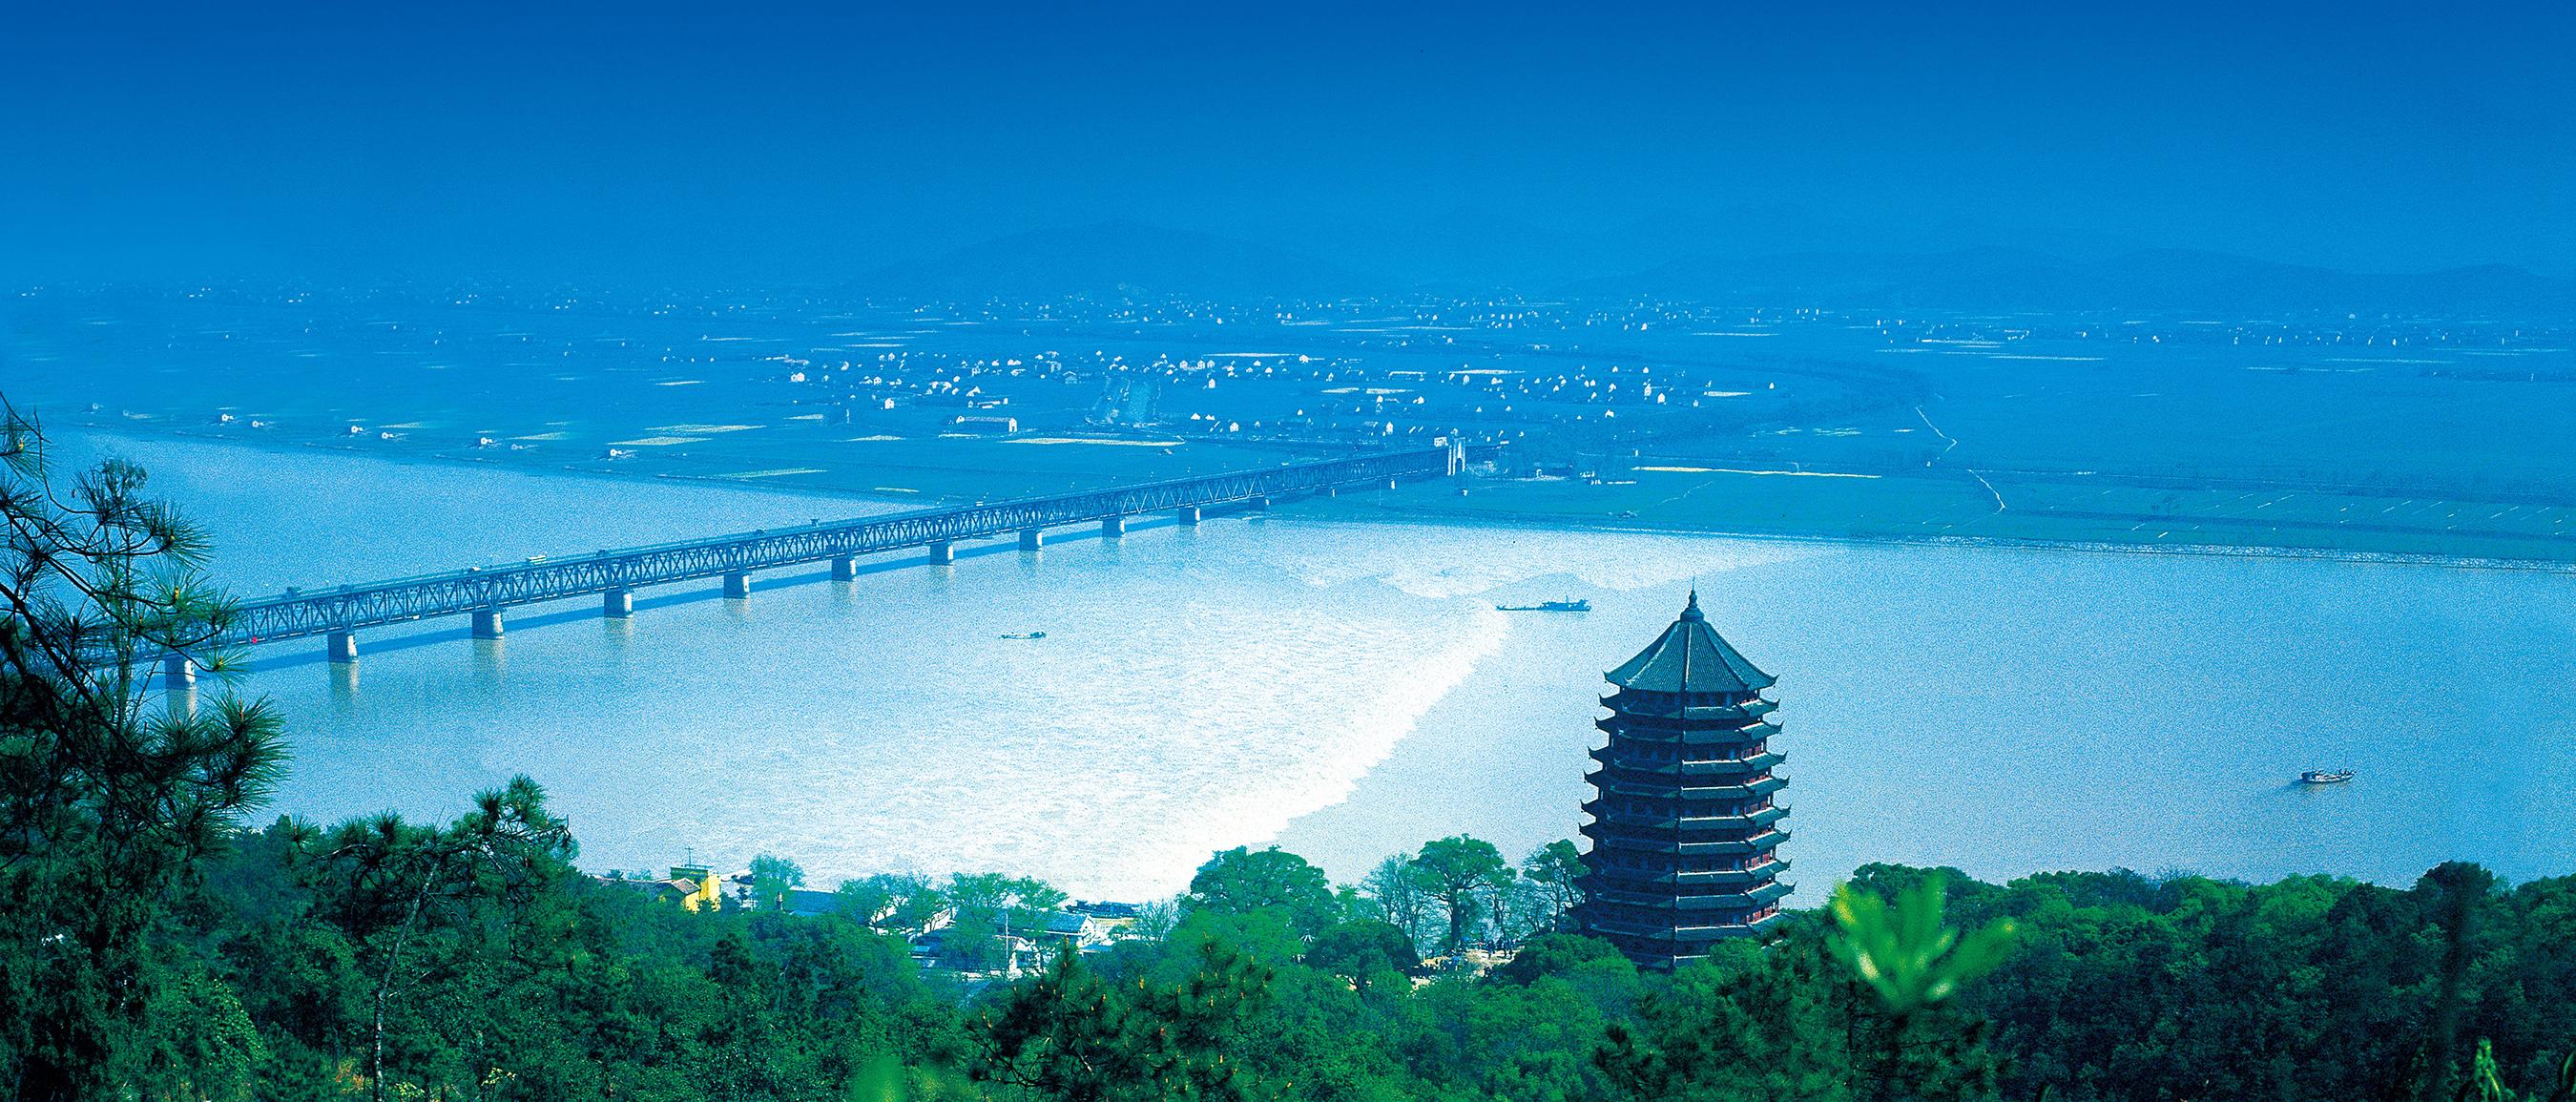 Qiantang River and Six Harmonies Pagoda